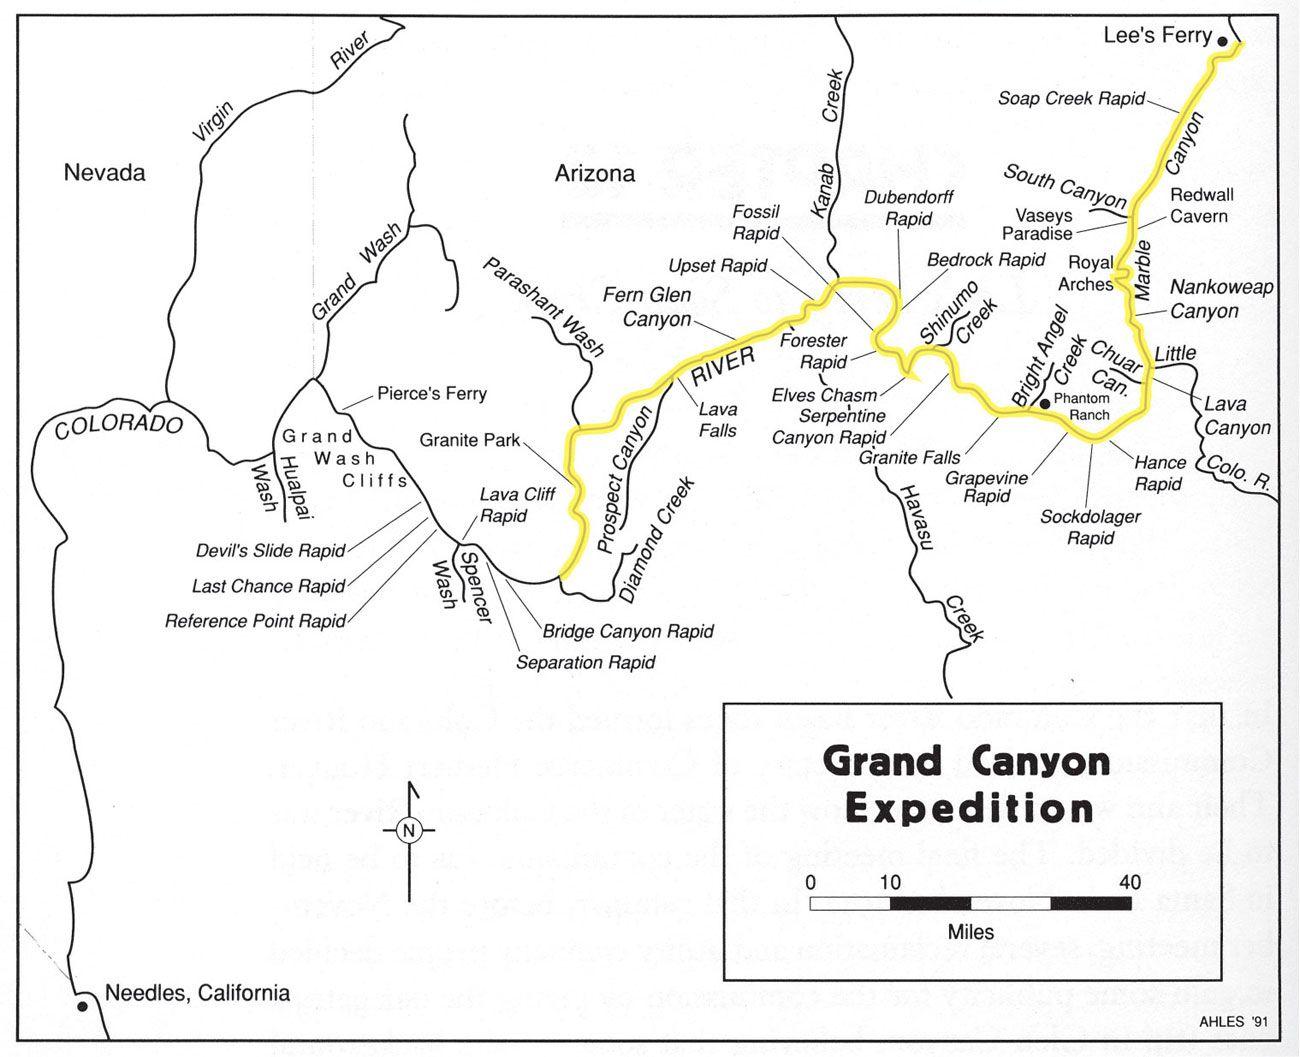 Grand Canyon River Expedition Map Grand Canyon National Park AZ US